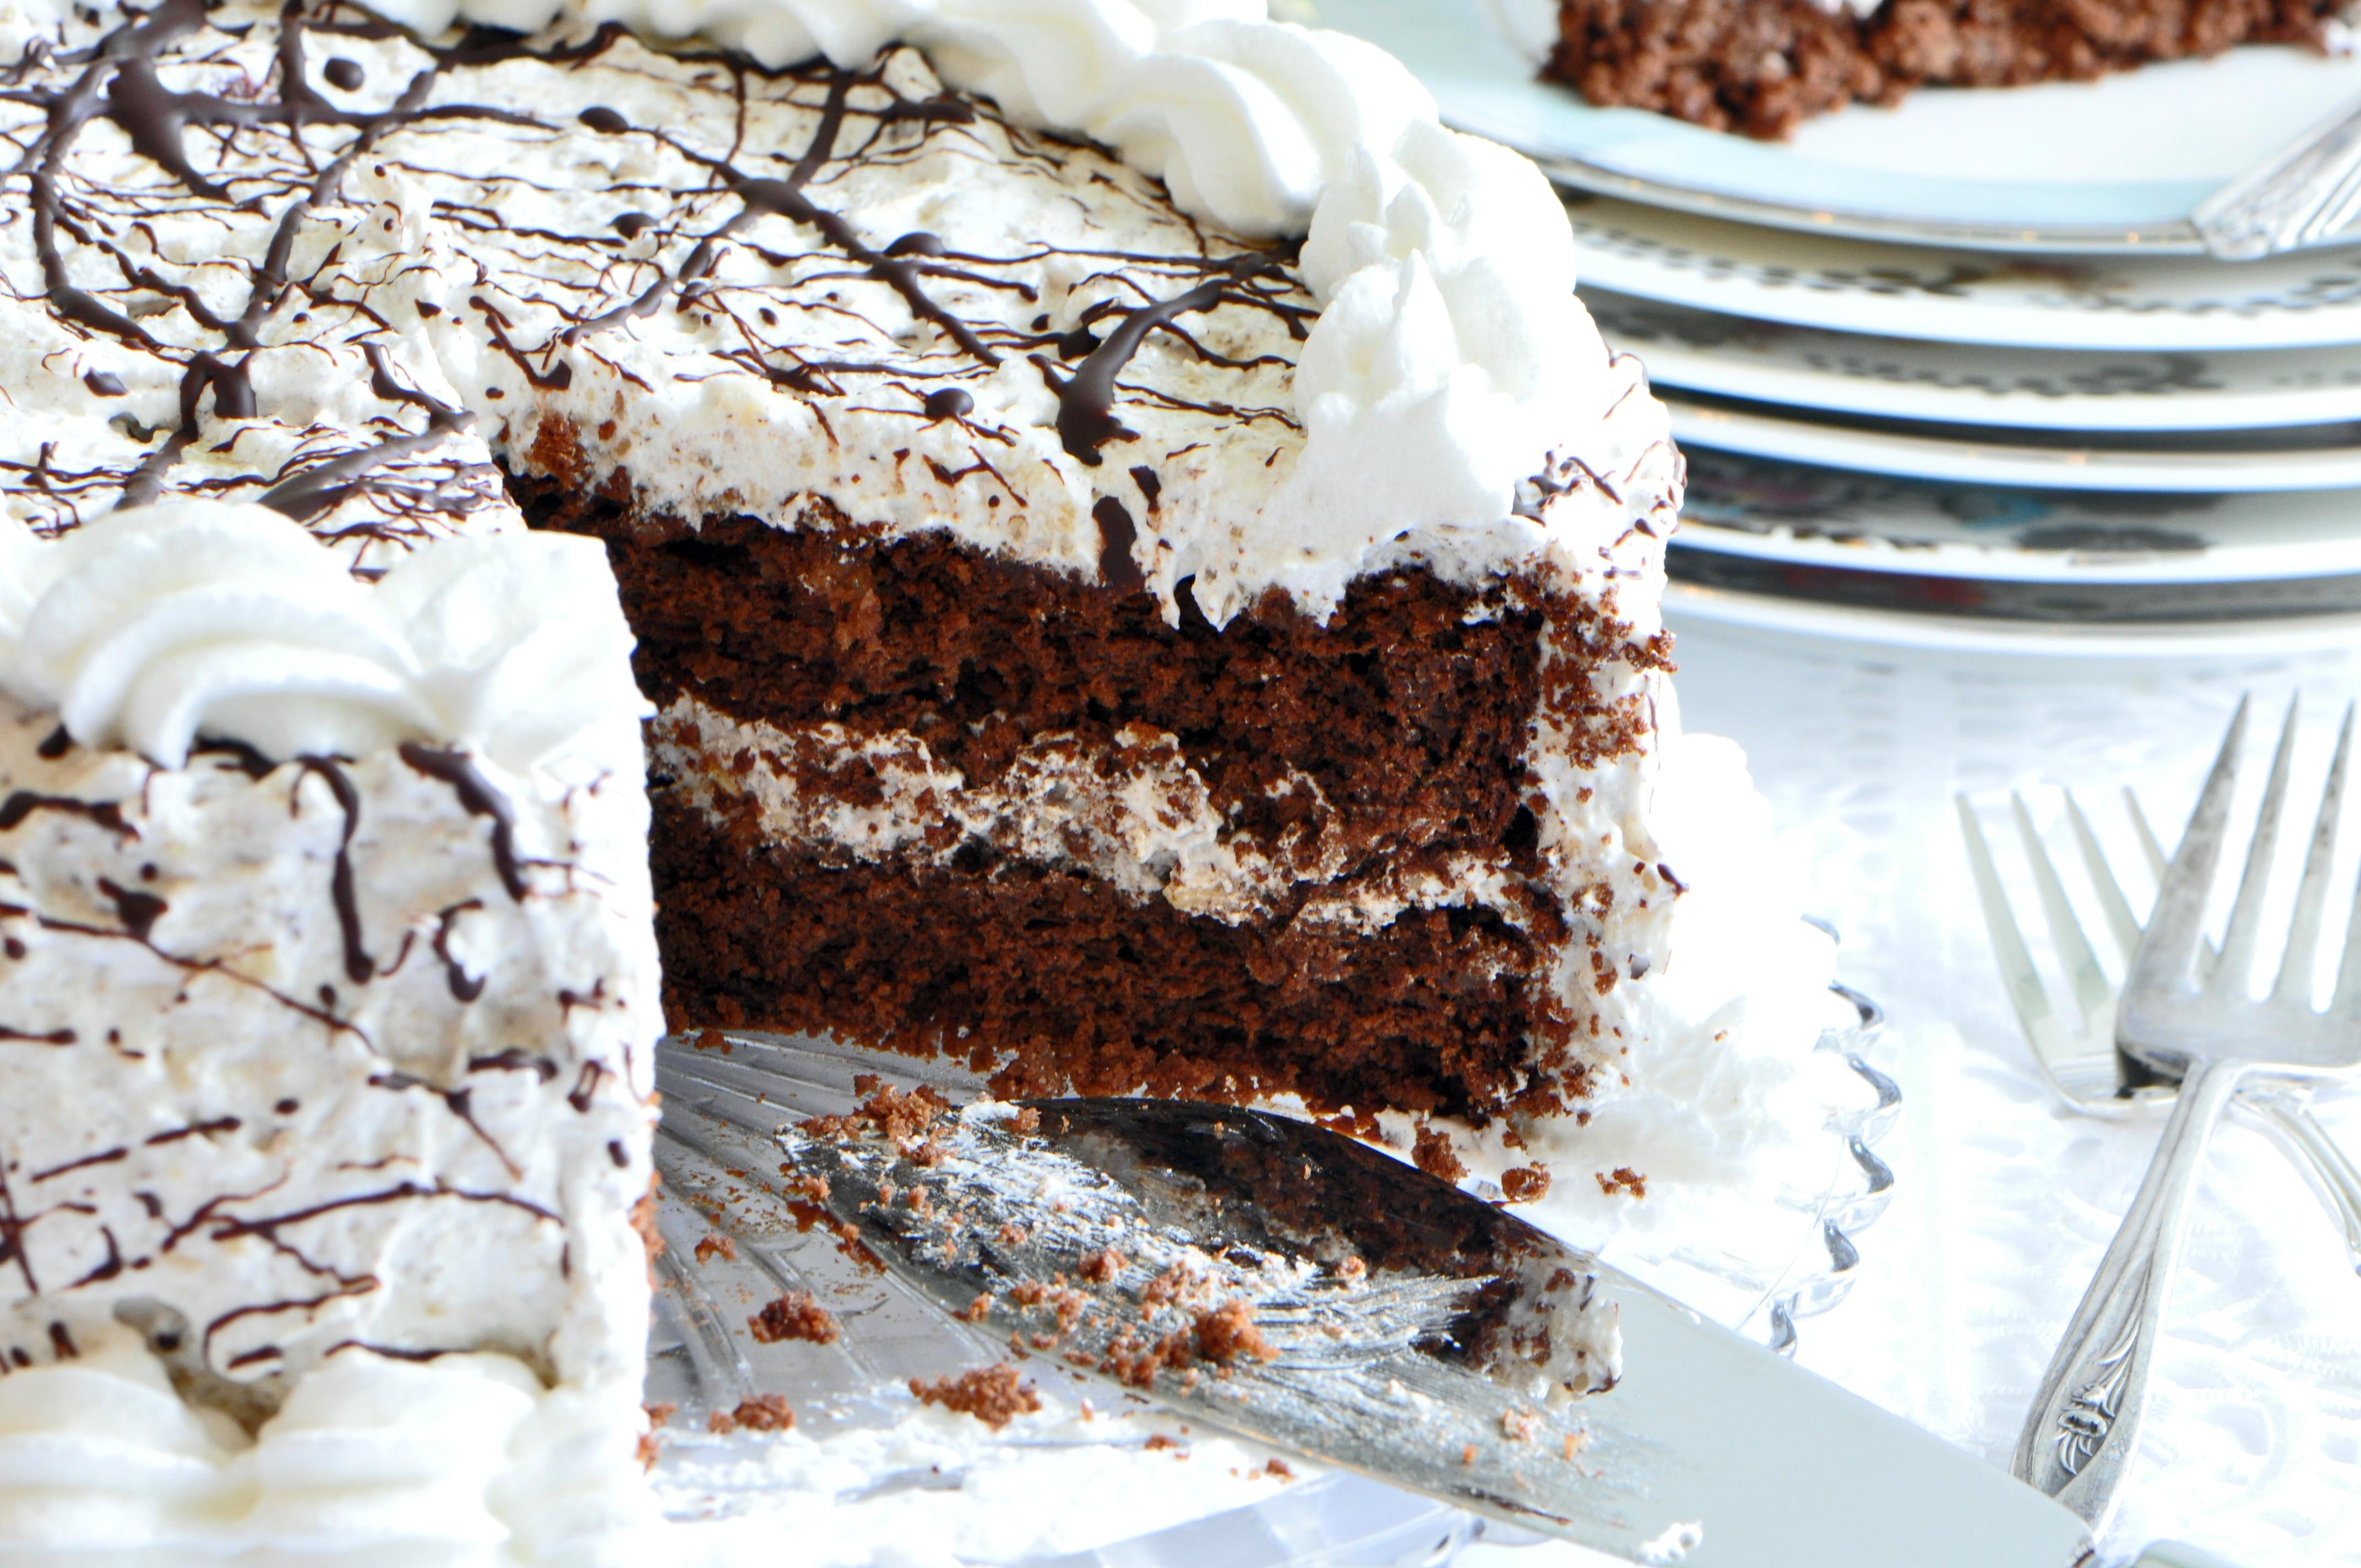 Passover Cake Recipes  Passover Dessert Chocolate Noisette Layer Cake Recipe